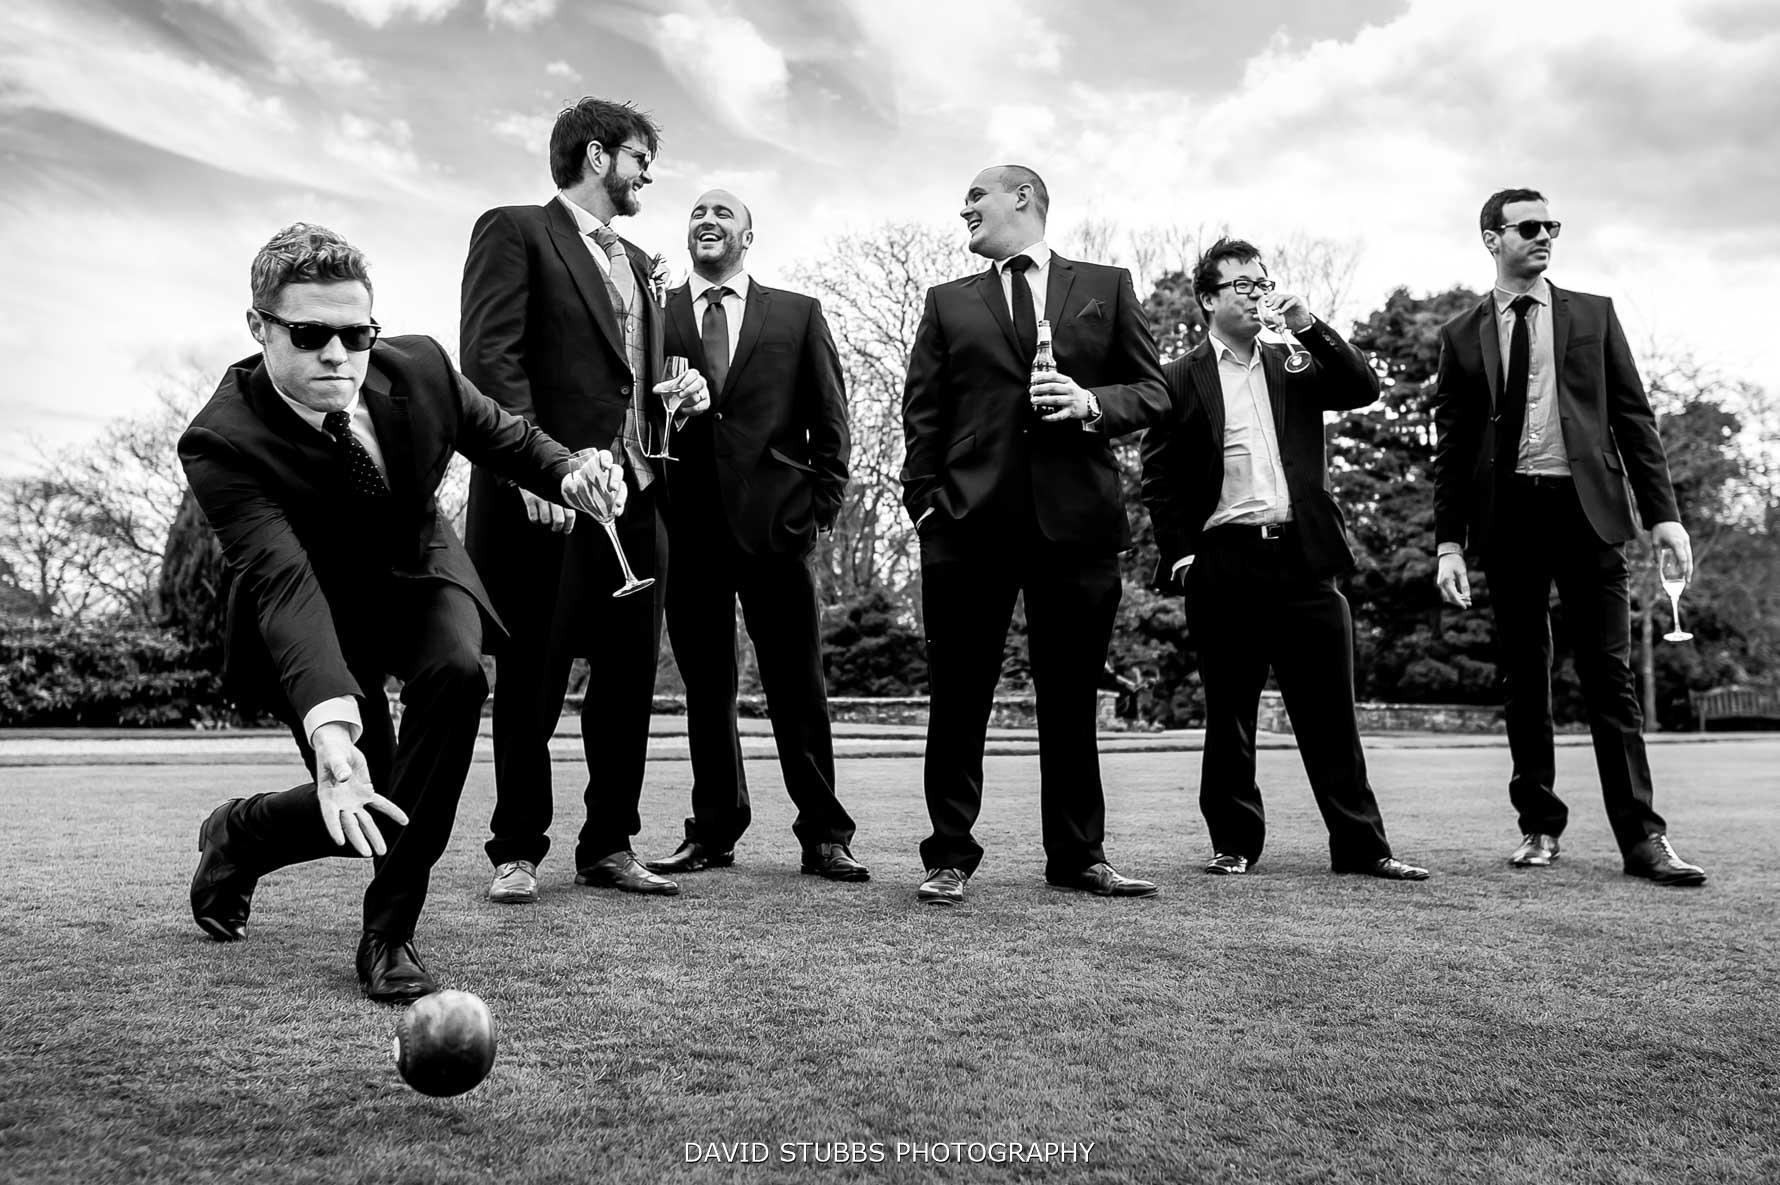 natural eaves hall wedding photo of groomsmen